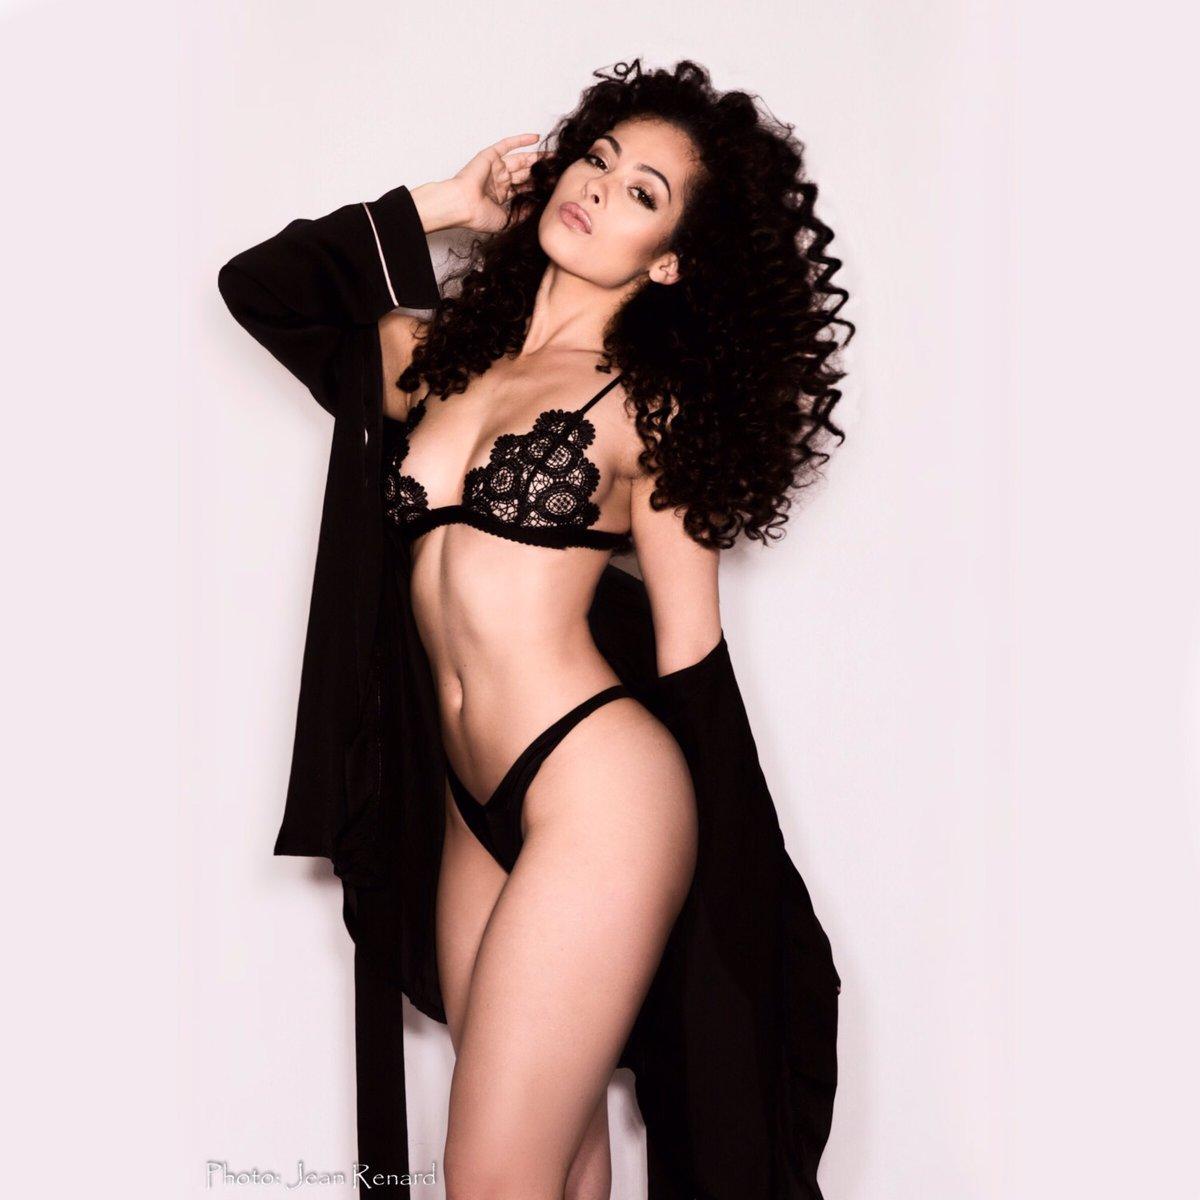 butt Celebrity Laura Ponticorvo naked photo 2017